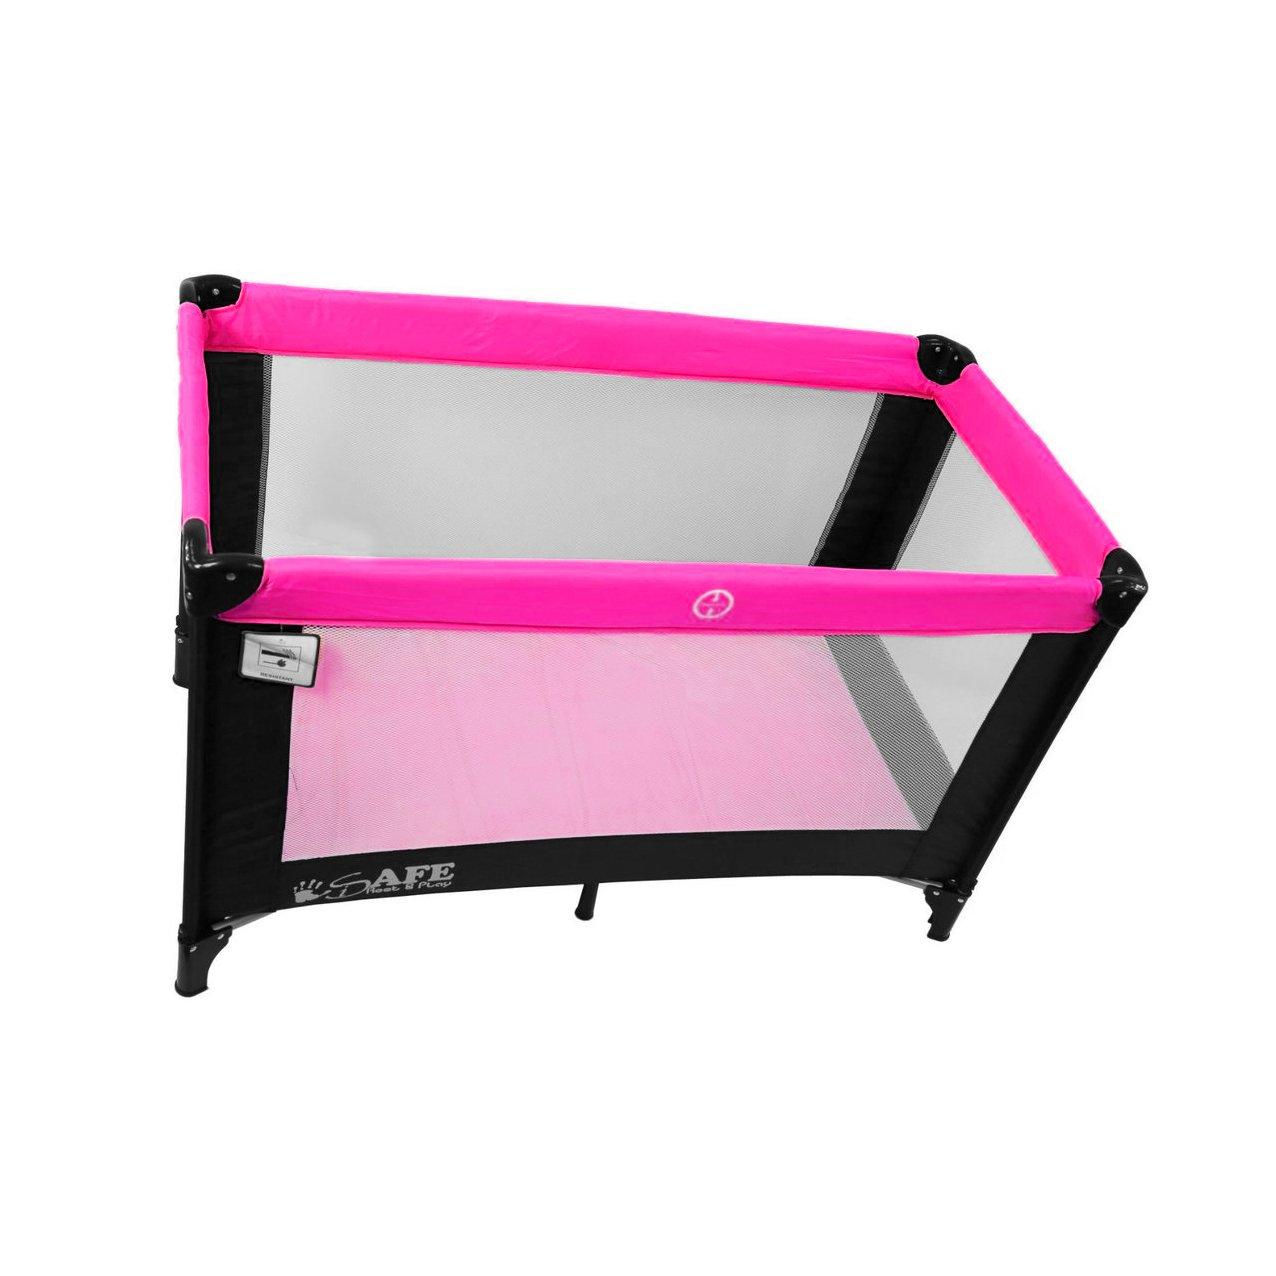 iSafe Rest /& Play Luxury Travel Cot//Playpen Black//Pink Raspberry 120 cm x 60 cm